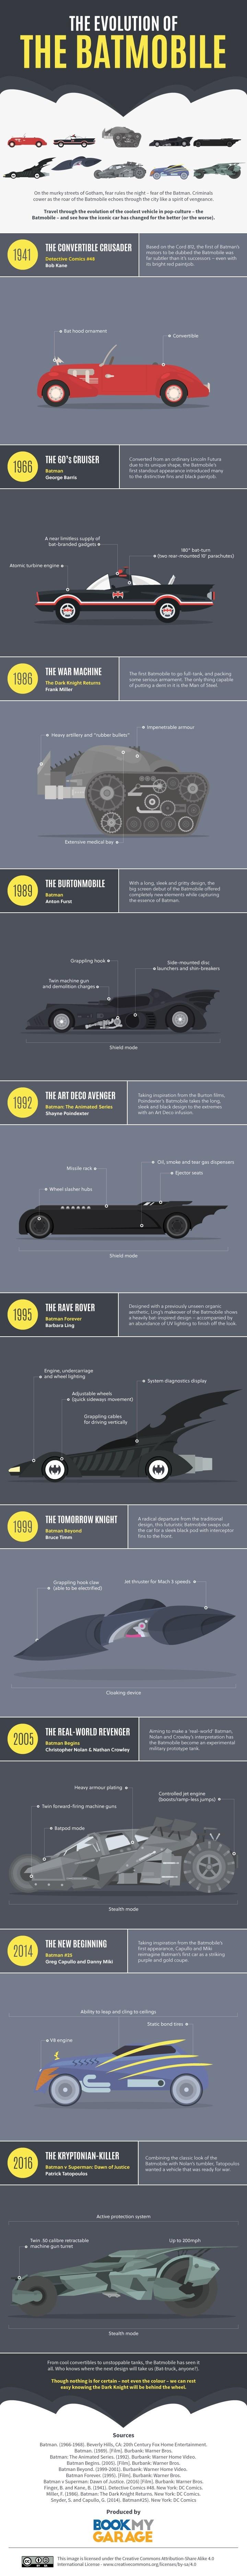 superheroes-batman-dc-infographic-batmobile